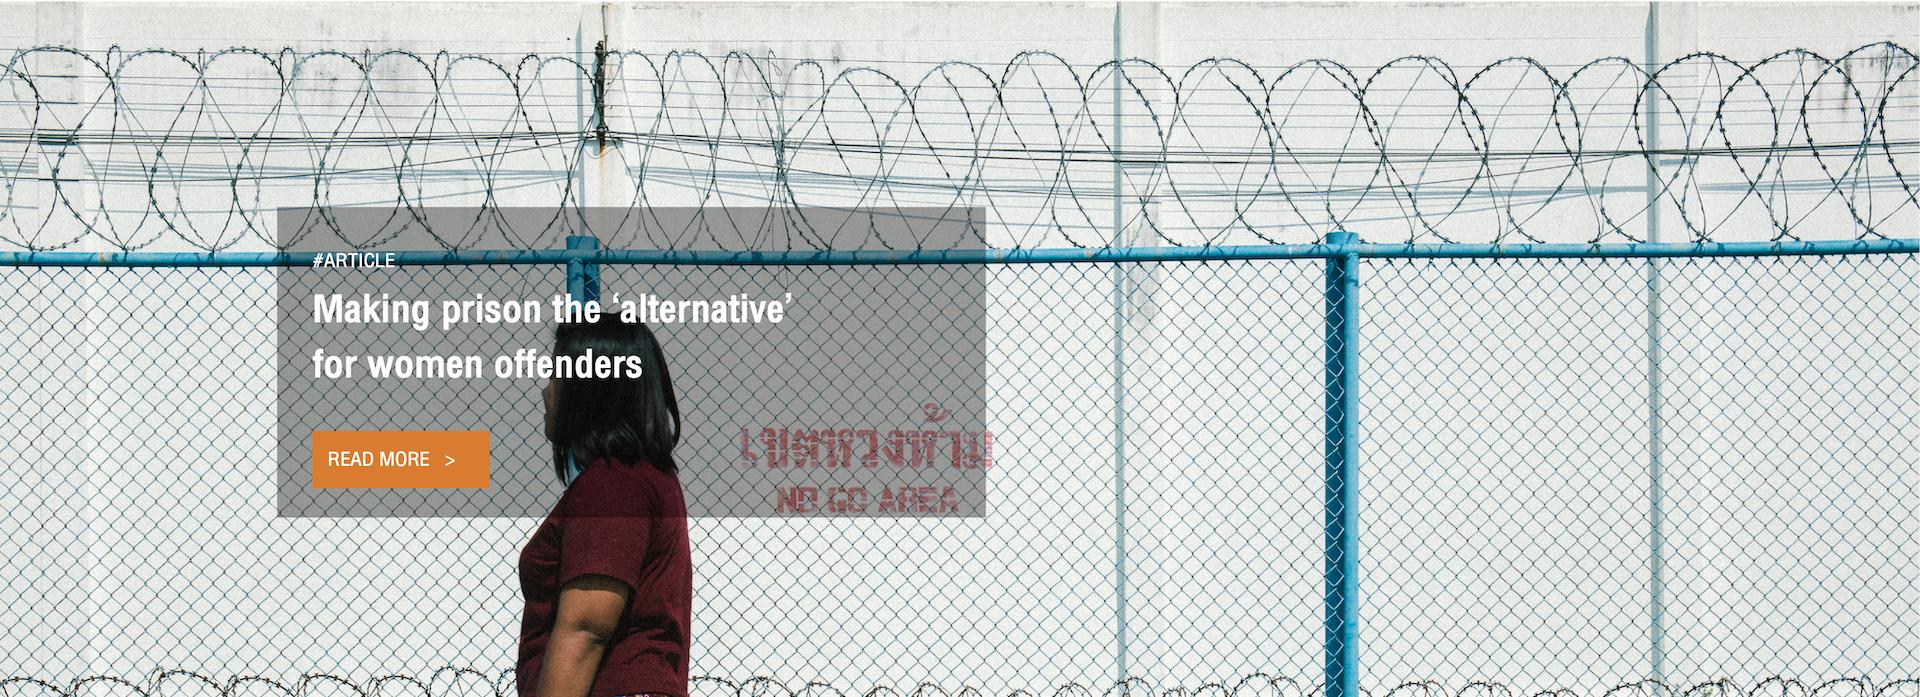 Making prison the 'alternative' for women offenders